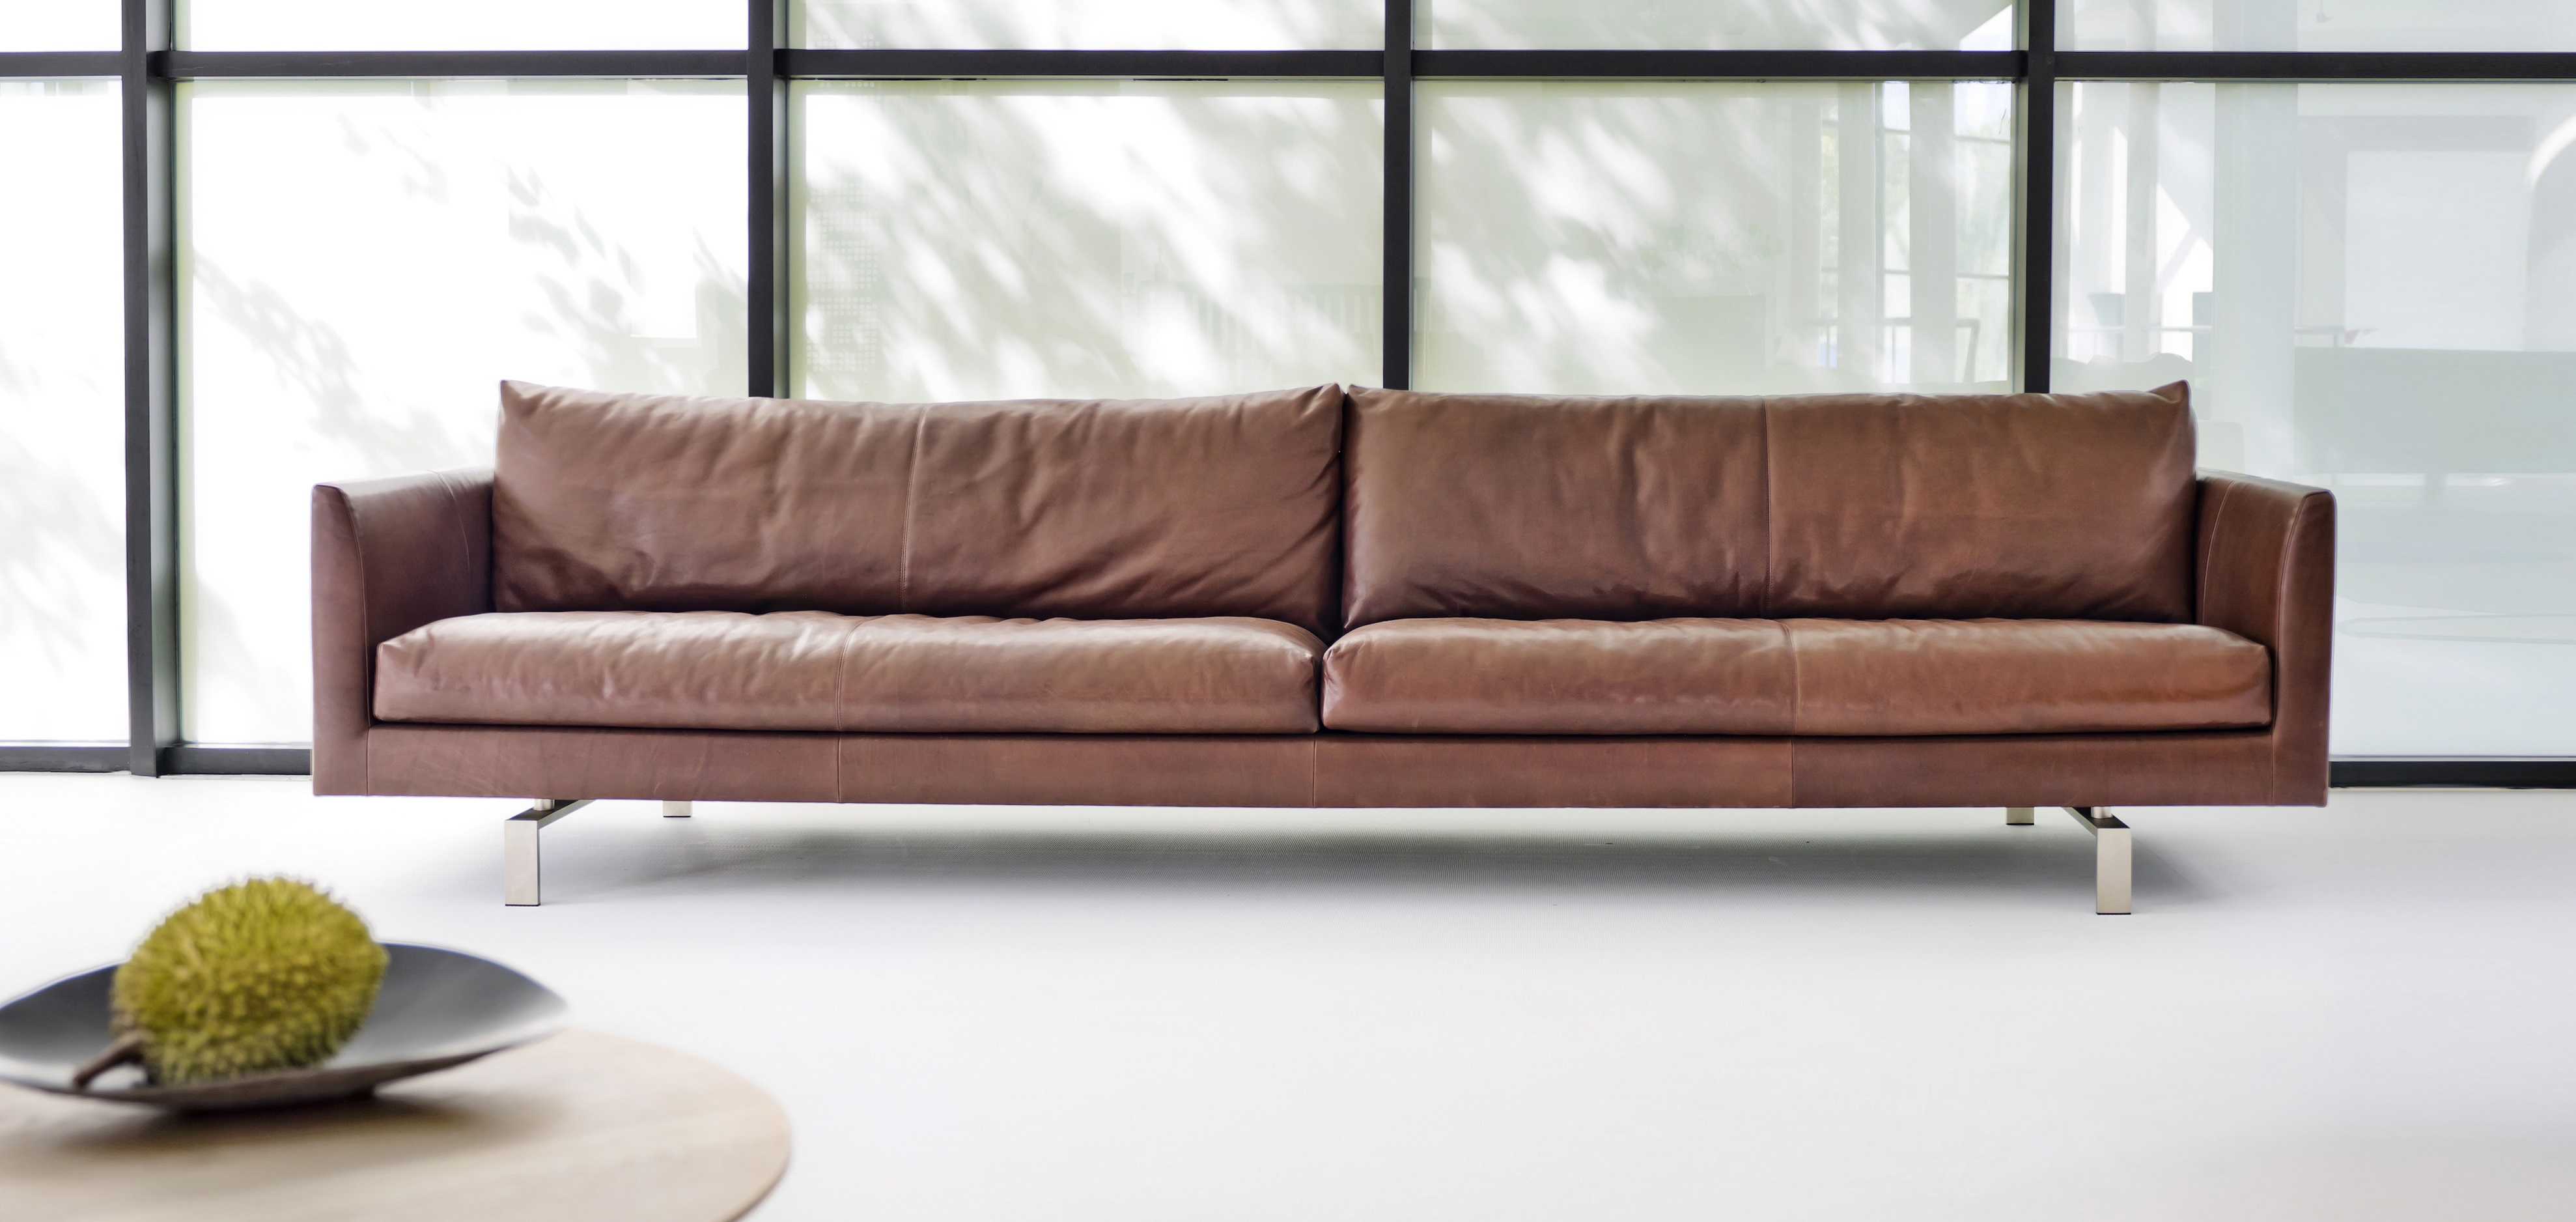 sofa axel von montis. Black Bedroom Furniture Sets. Home Design Ideas